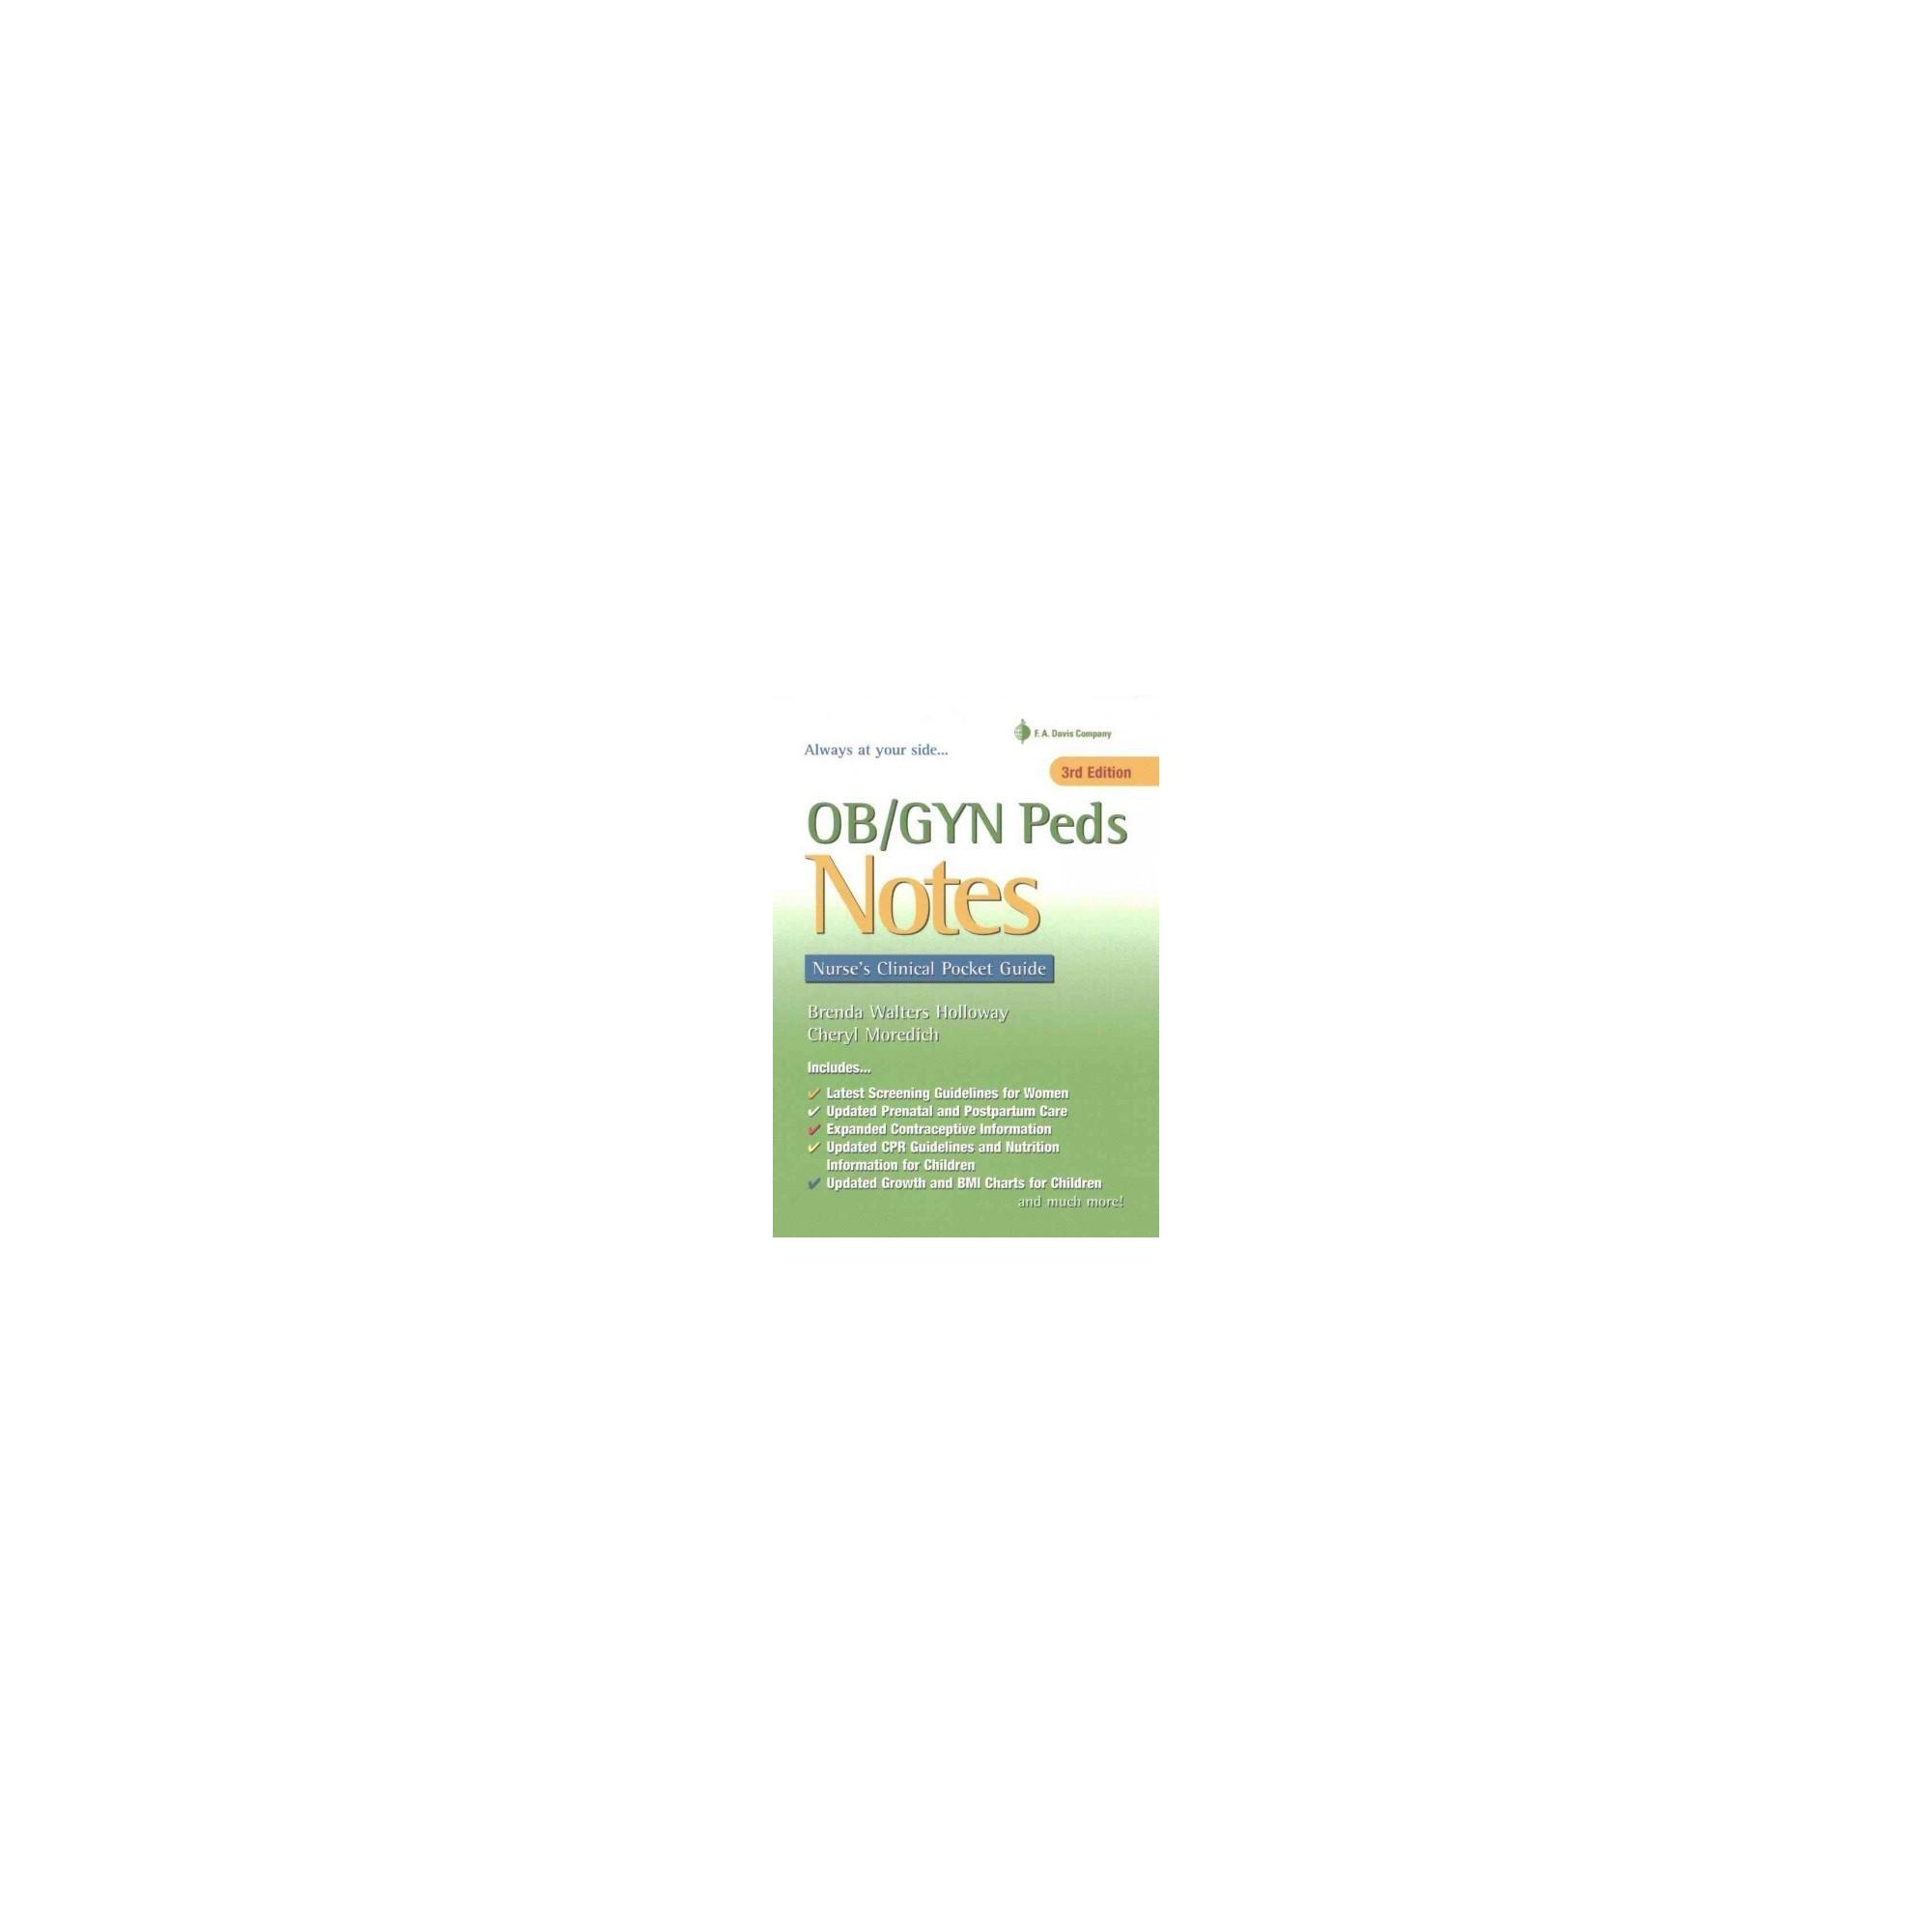 Ob Gyn Peds Notes Nurse S Clinical Pocket Guide Paperback